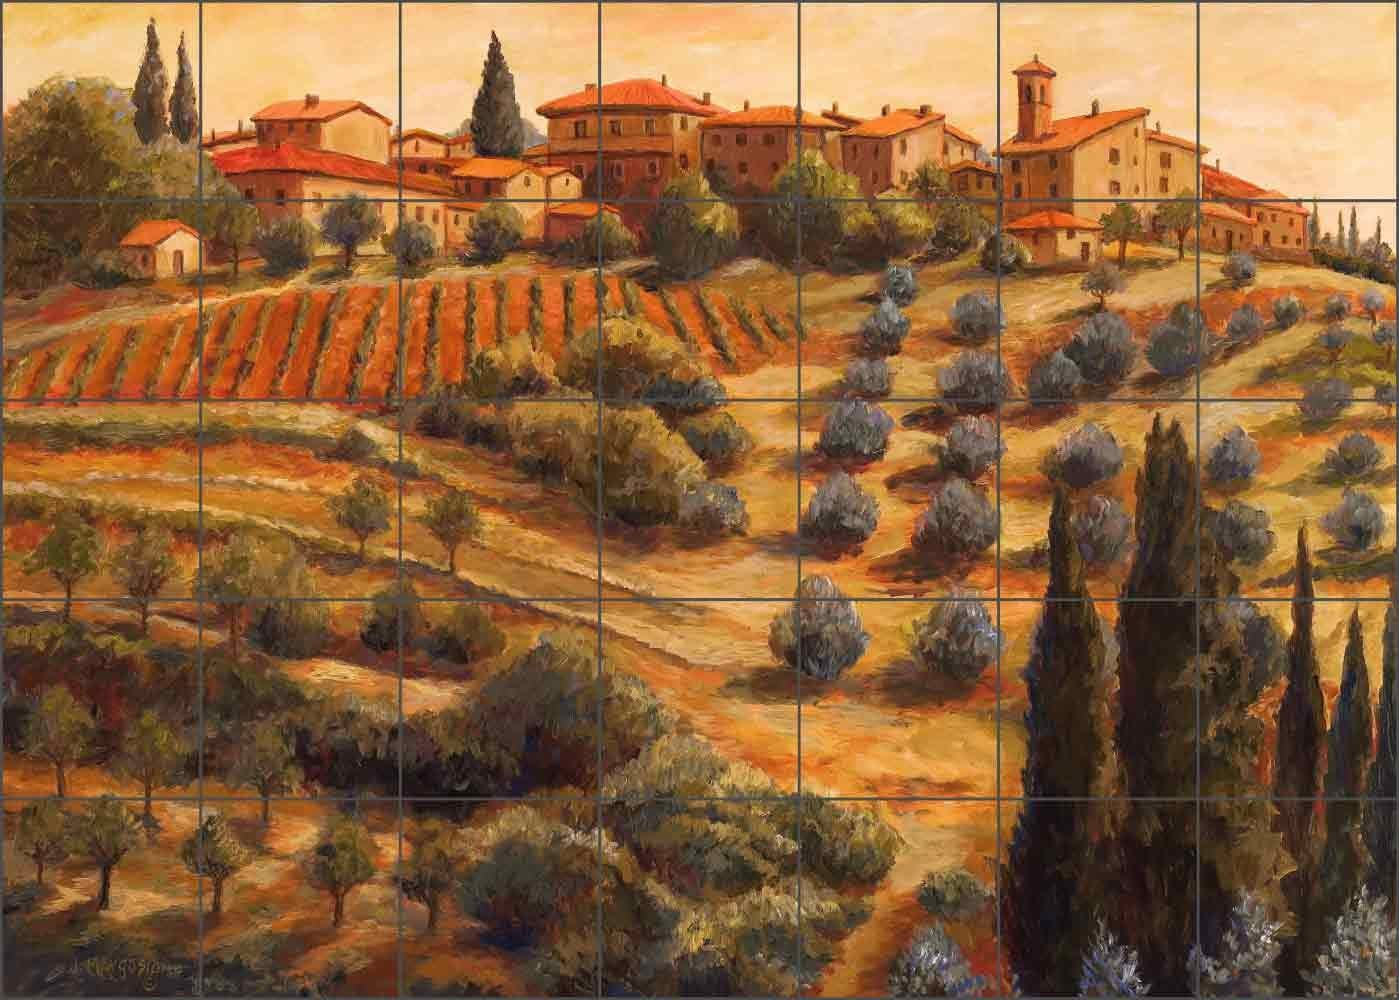 - Tuscan Tile Mural Backsplash - Chianti Sunset By Joanne Morris